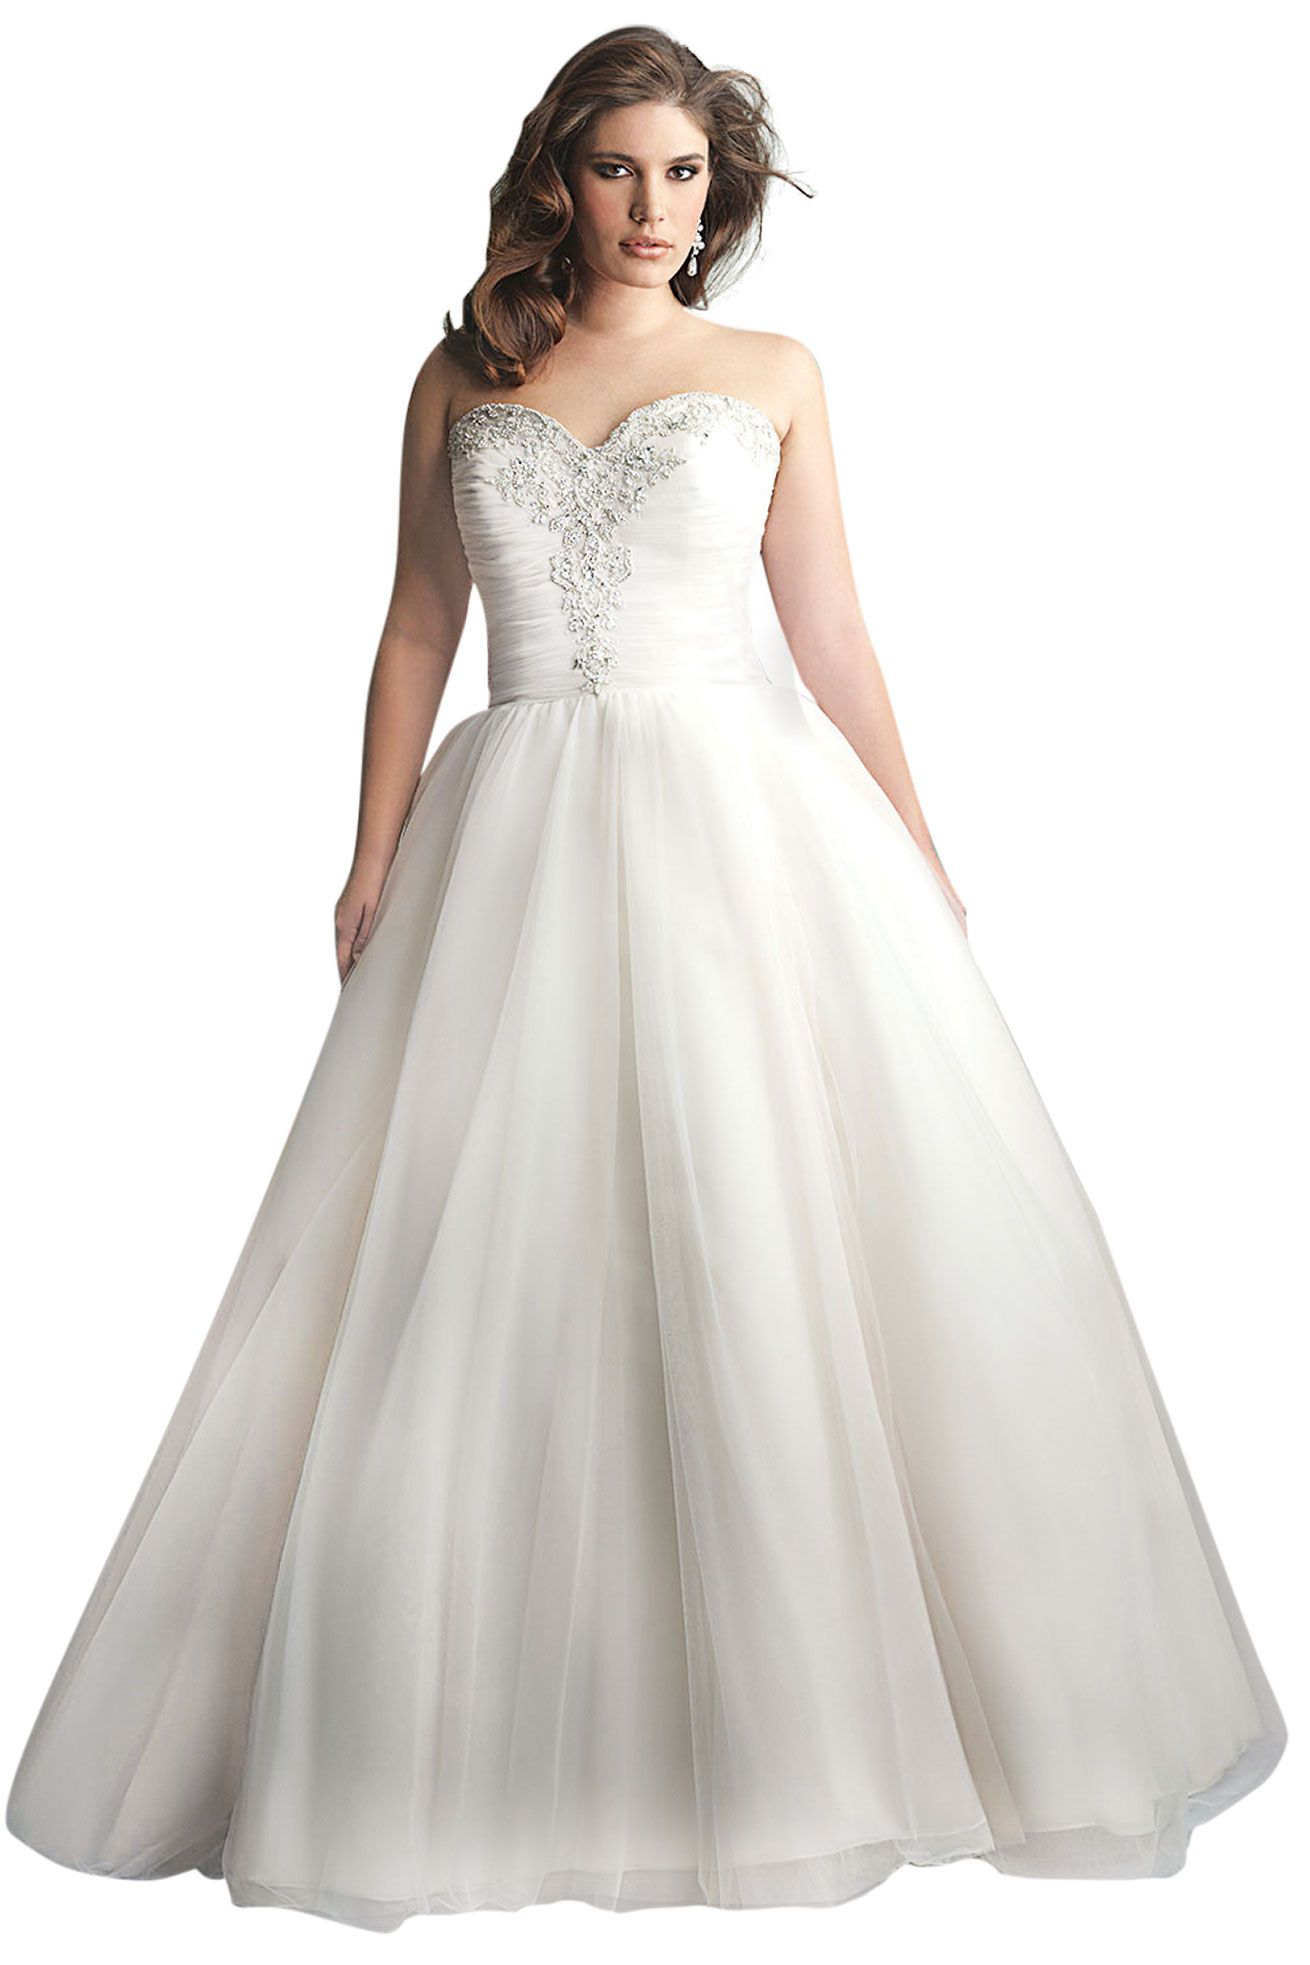 Best Wedding Dress for Your Body Type | Best wedding ...